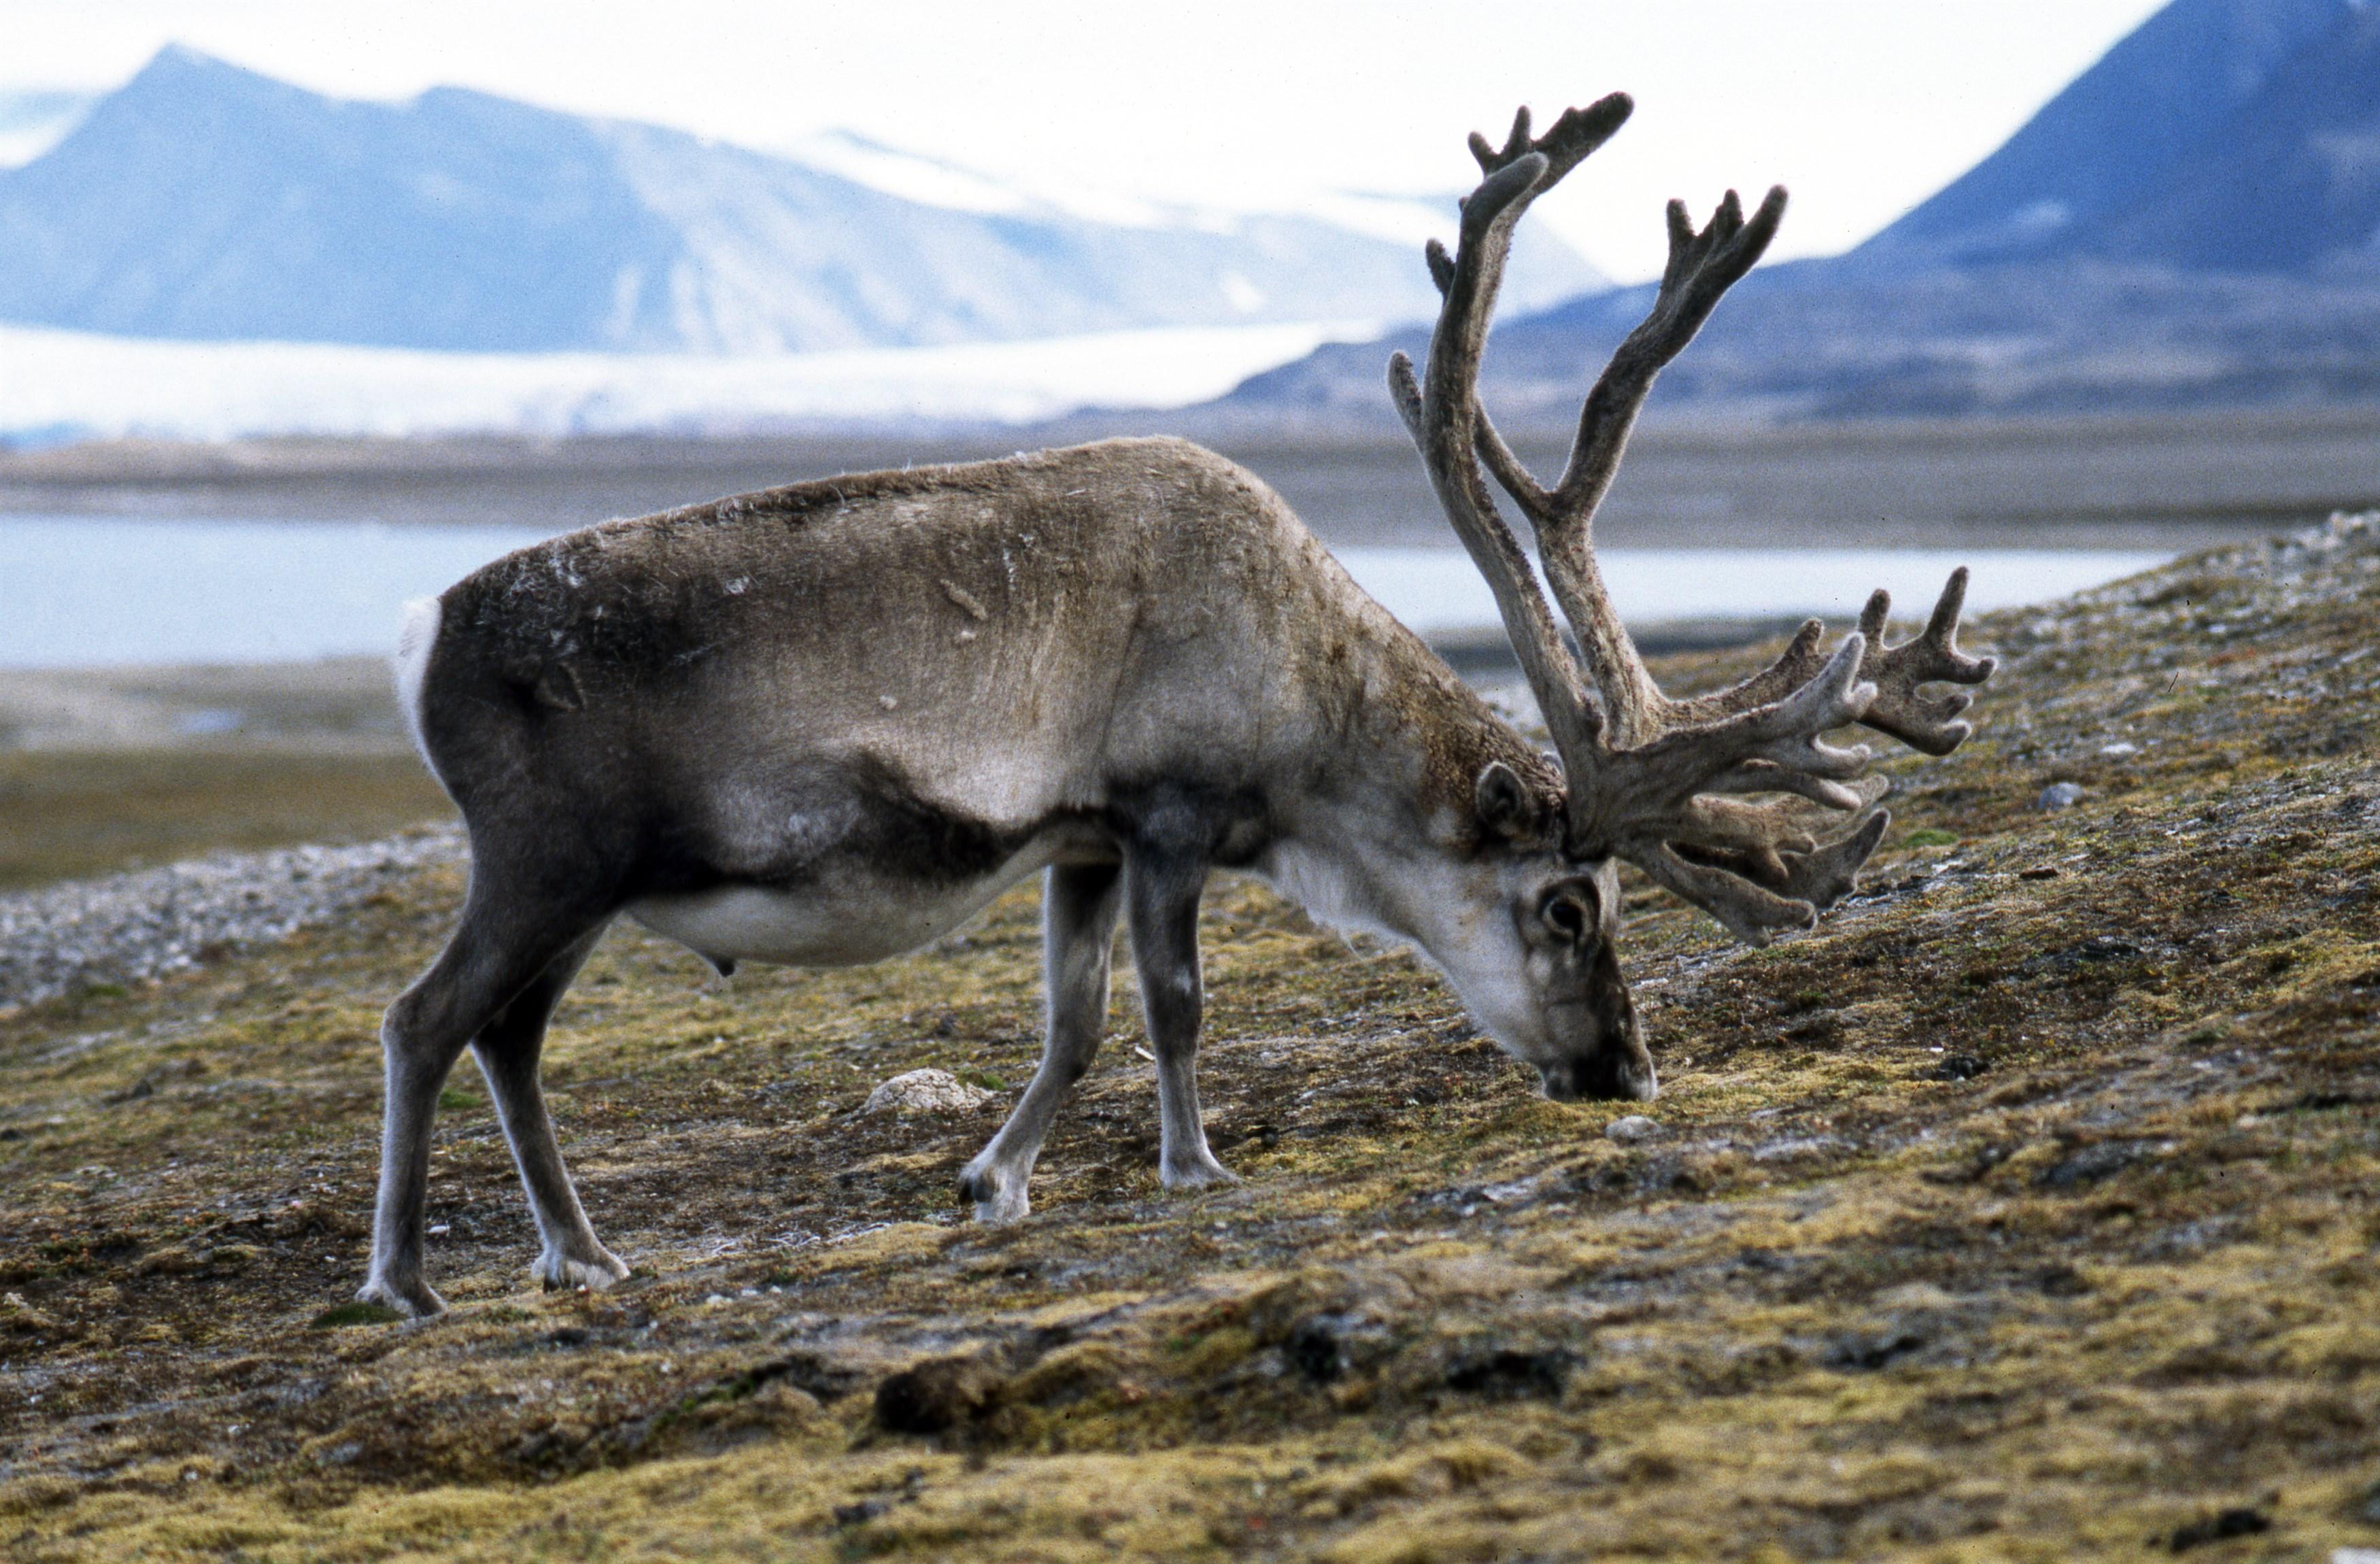 svalbard-reindeer-rangifer-tarandus-platyrhynchus-at-plateau-mountain-near-longyearbyen-svalbard_d765-3500x2300px